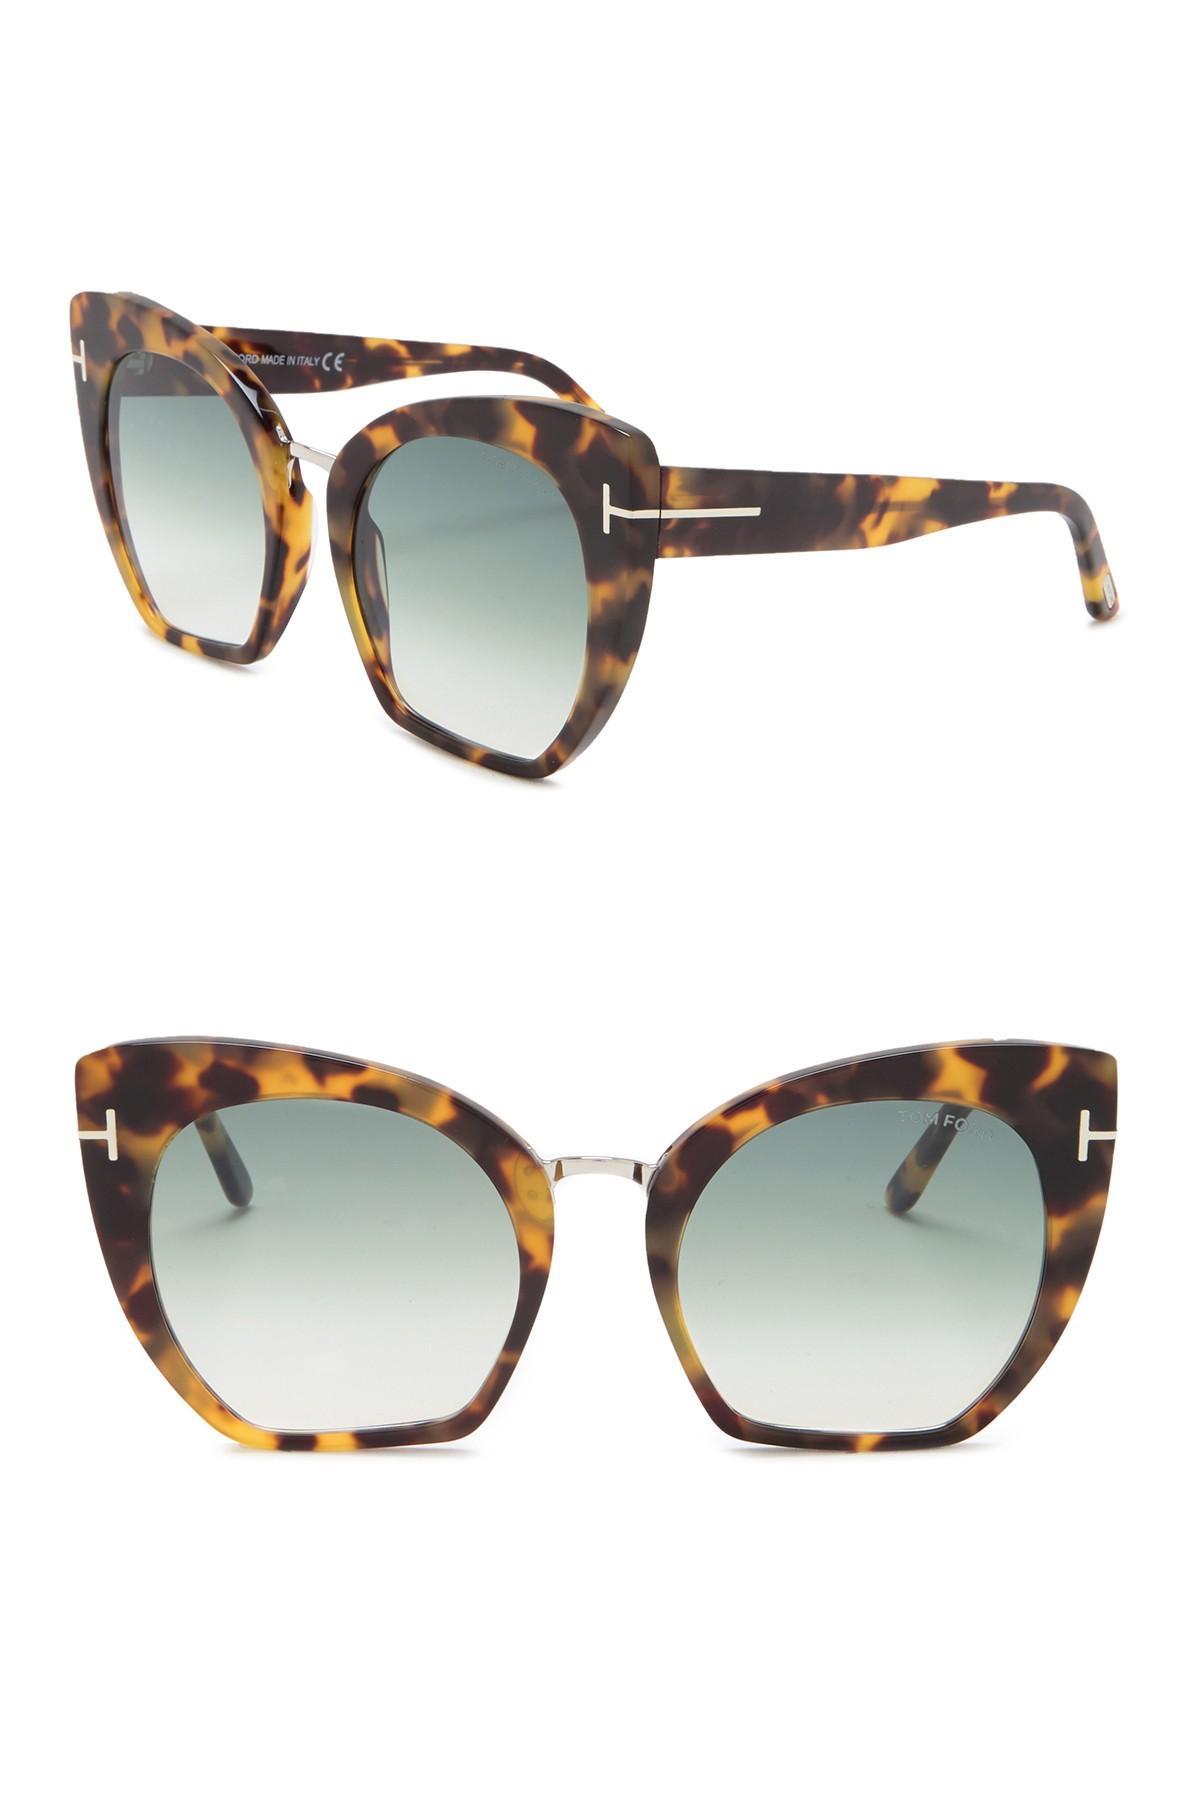 0a202321dcd6 Tom Ford. Women s Samantha 55mm Modified Cat Eye Sunglasses